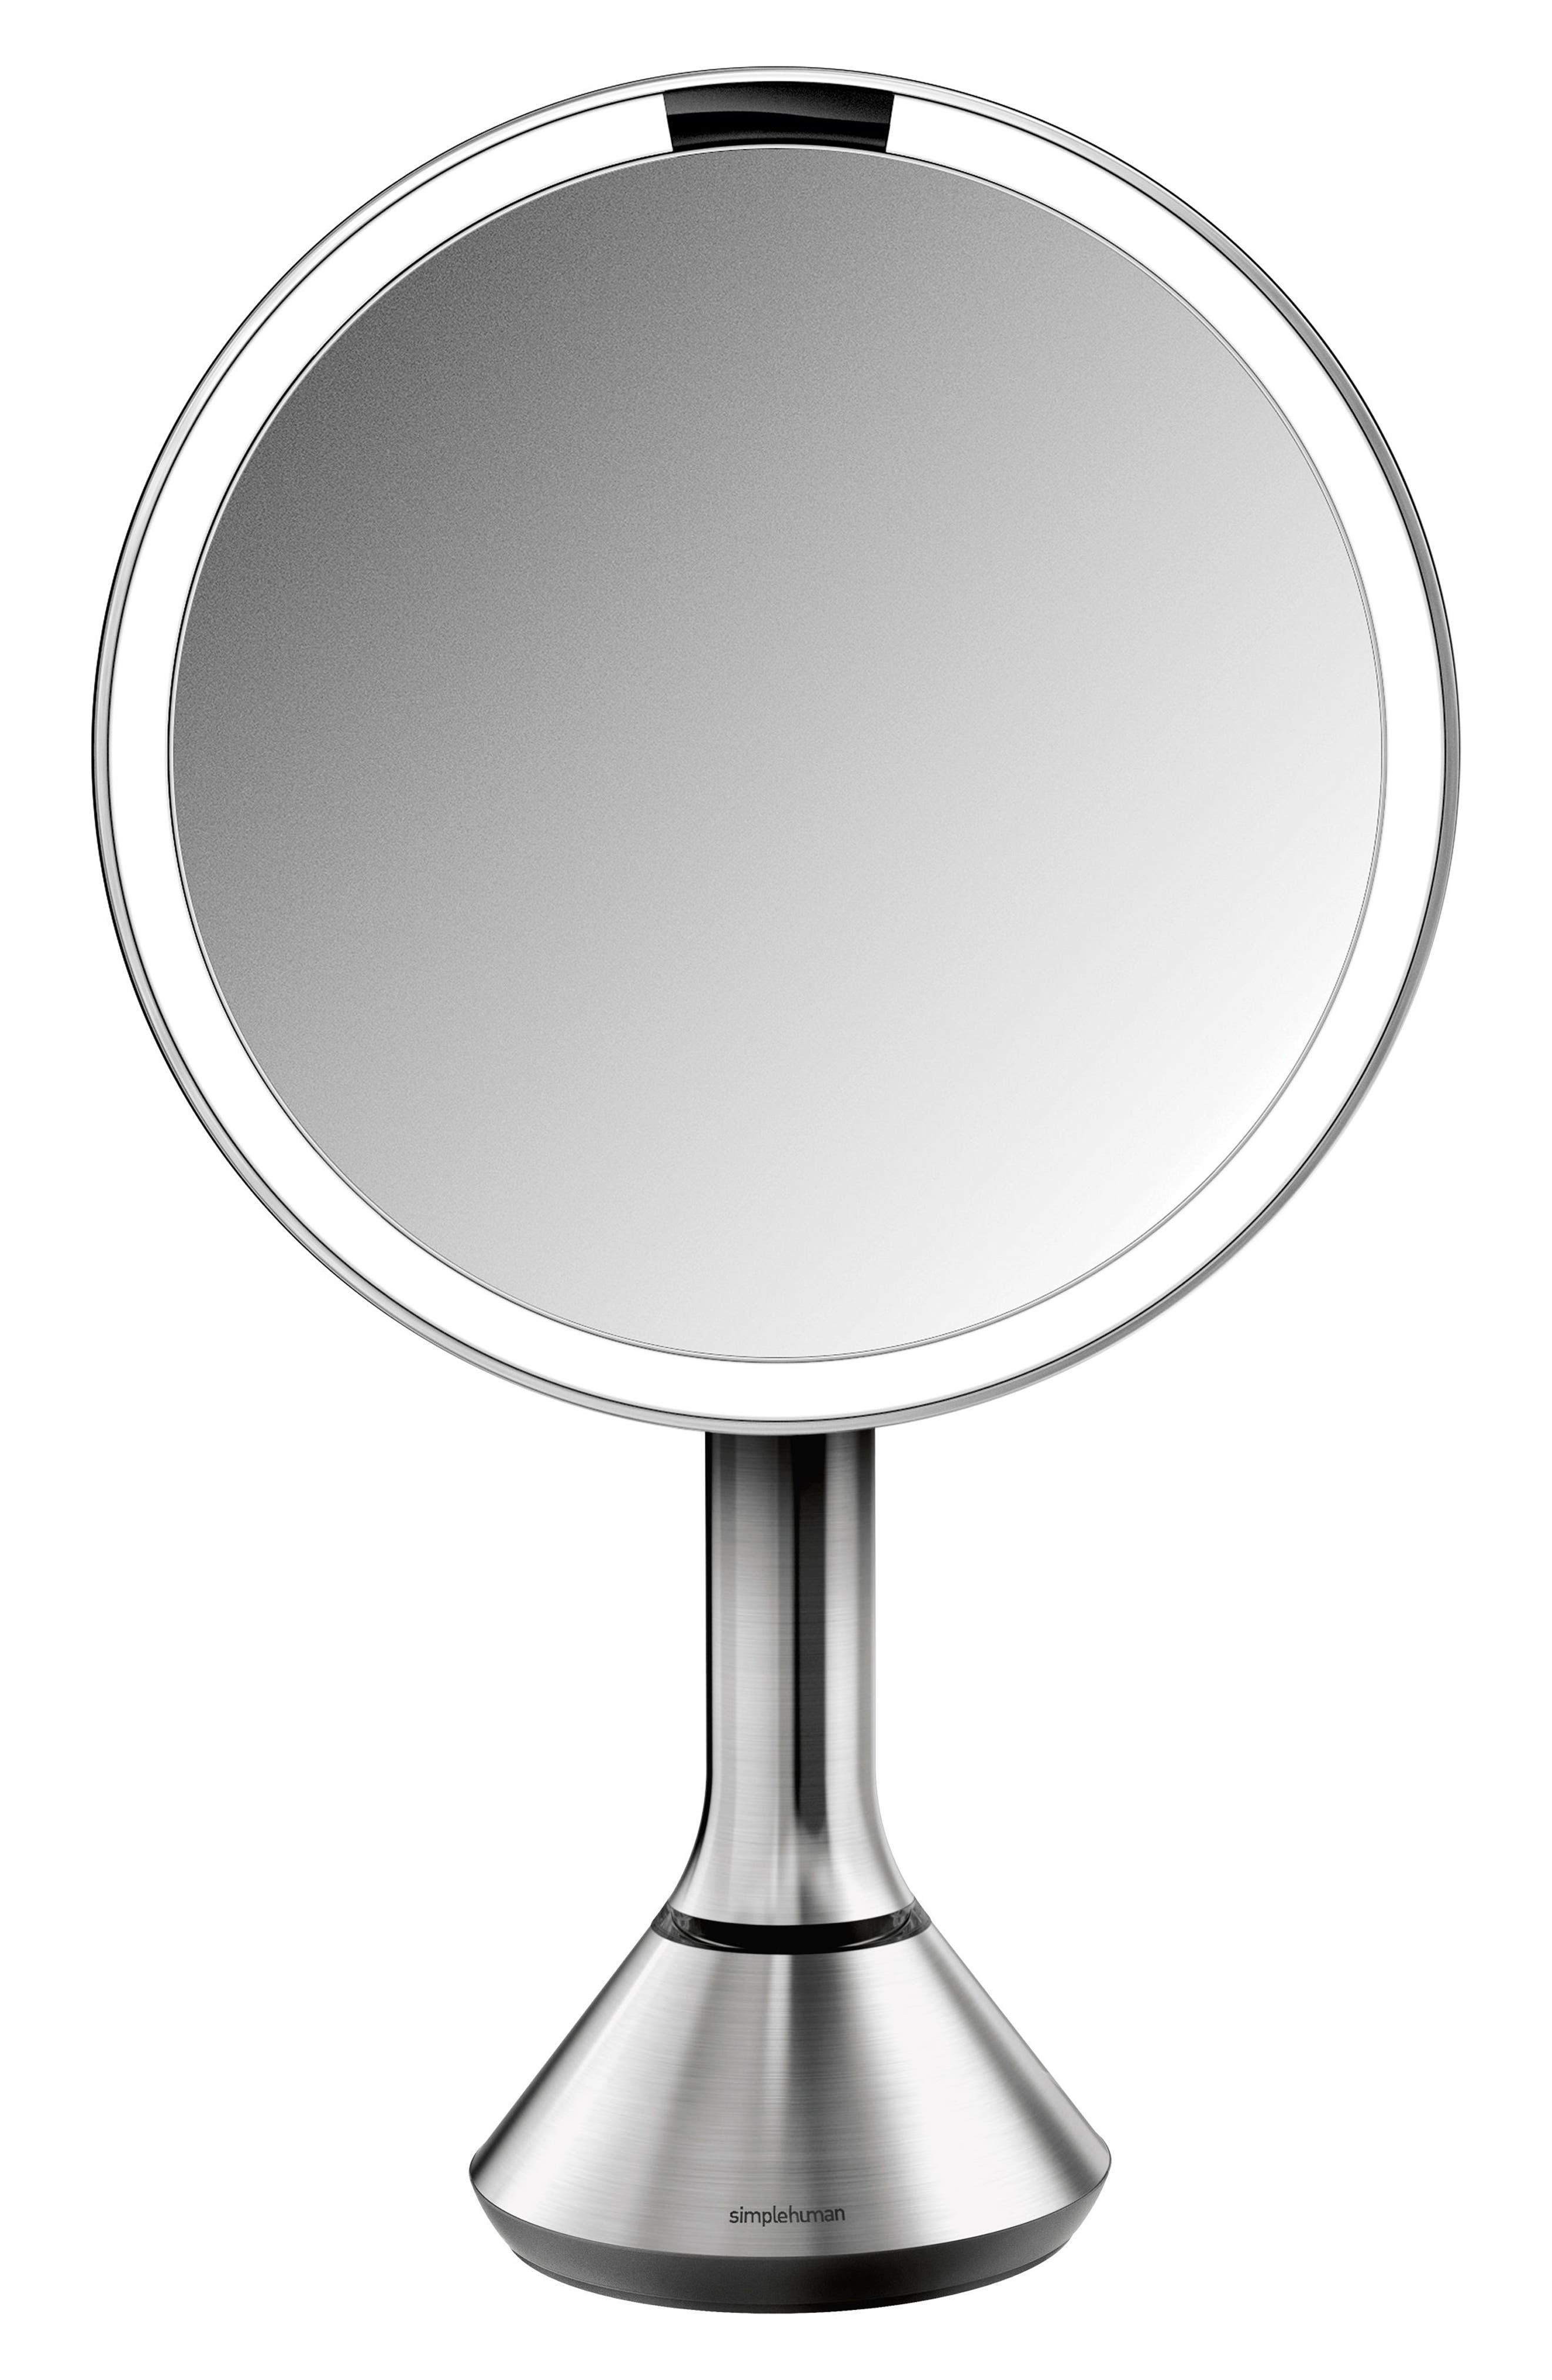 Alternate Image 1 Selected - simplehuman Eight Inch Sensor Mirror with Brightness Control